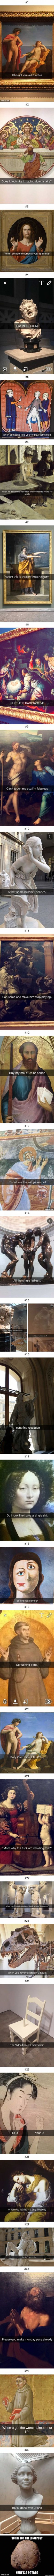 30 Museum Snapchats That'll Make Art History Fun Again